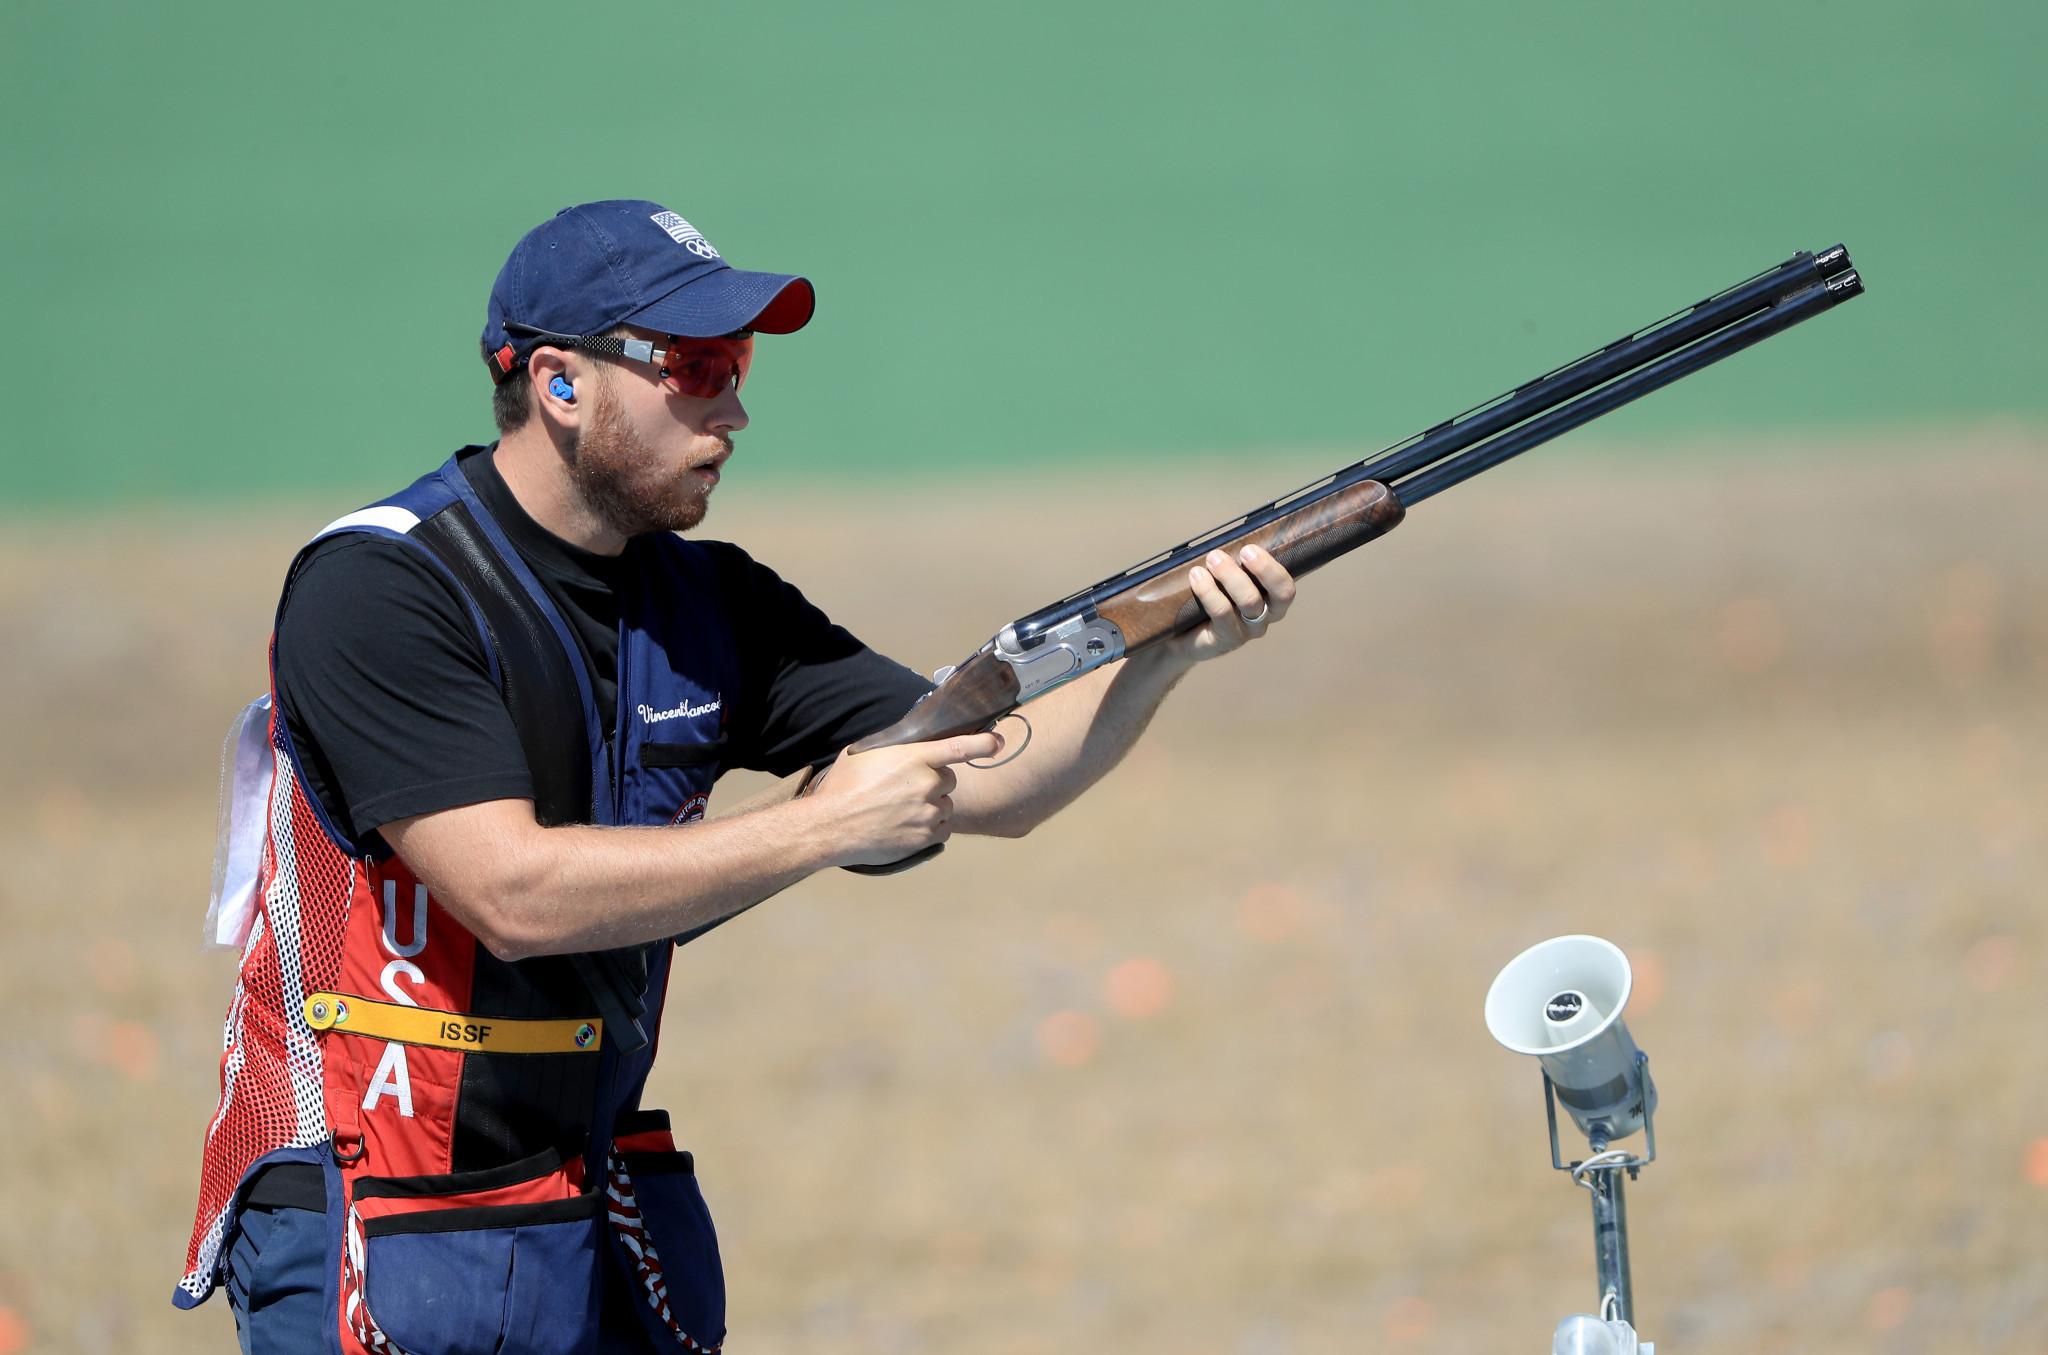 US strike mixed team skeet gold at ISSF Shotgun World Cup in Lonato